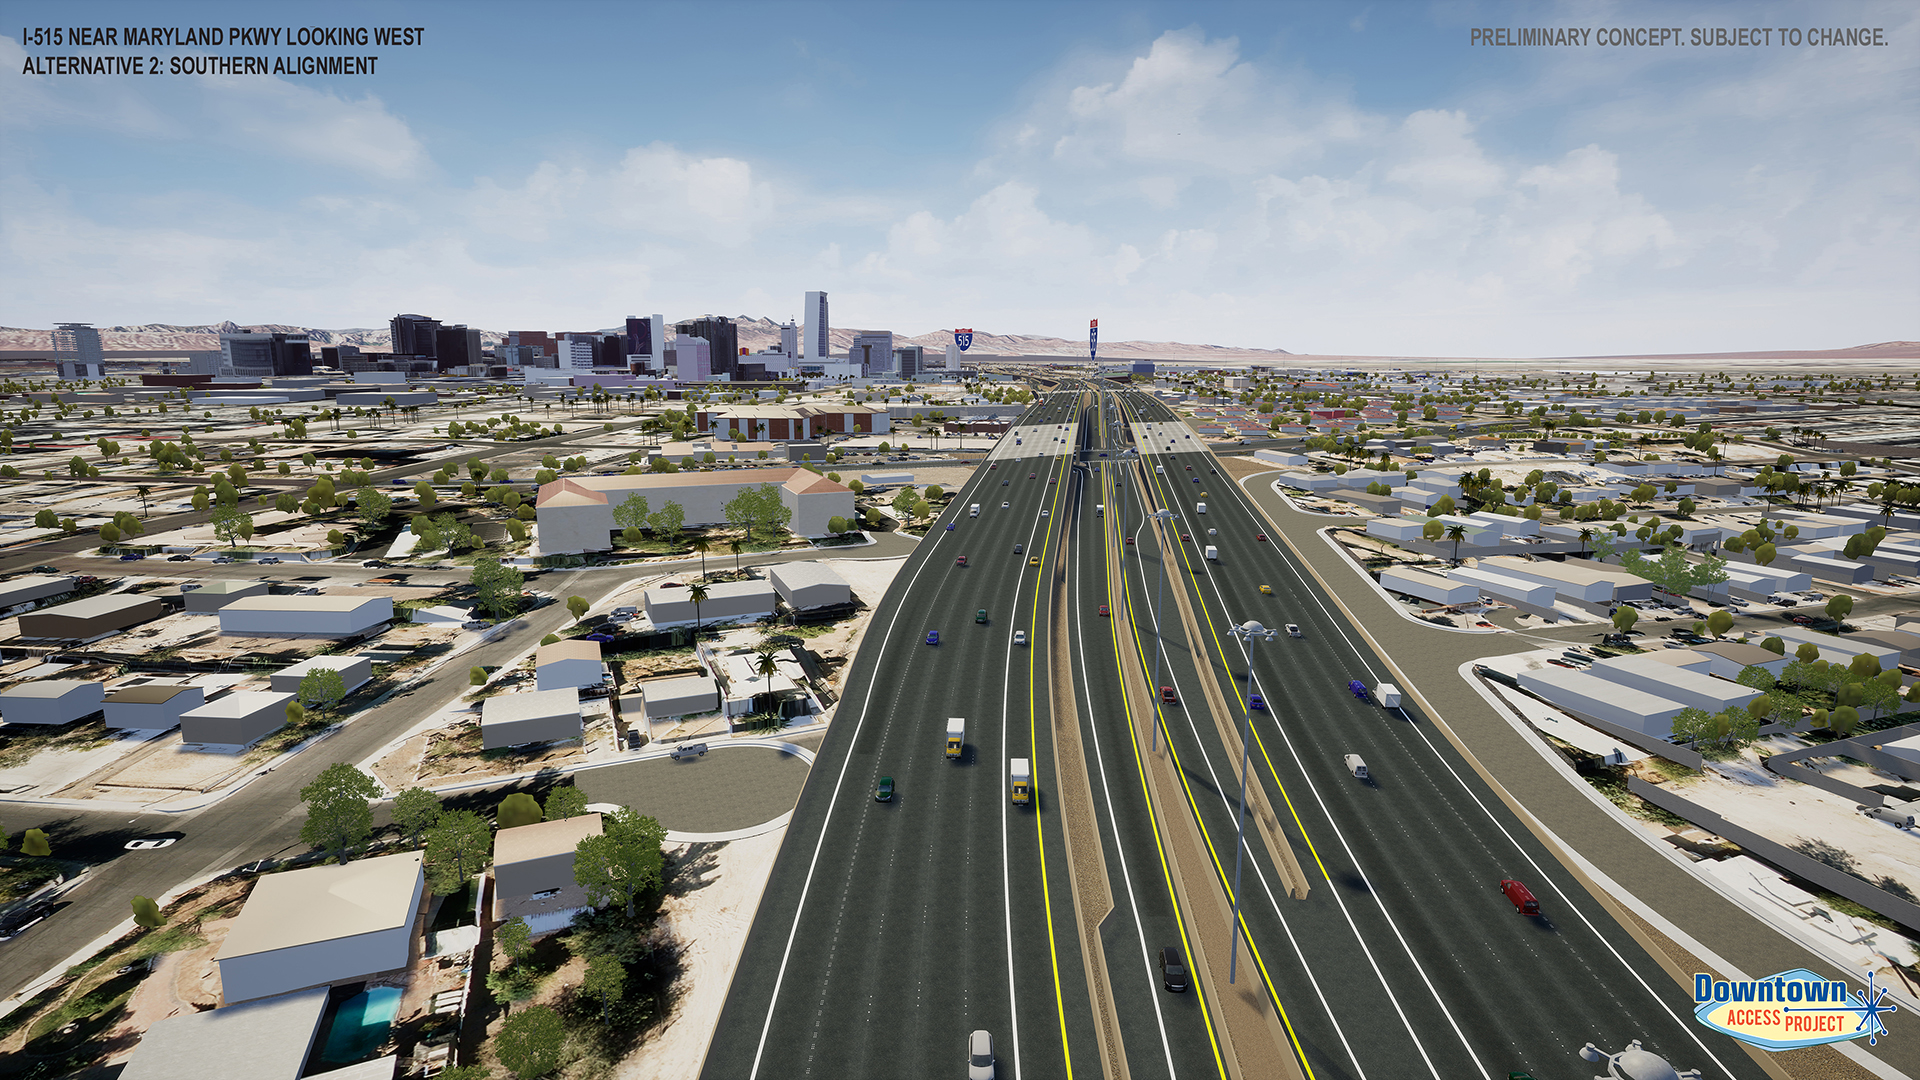 I-515 near maryland parkway alternative 2 rendering